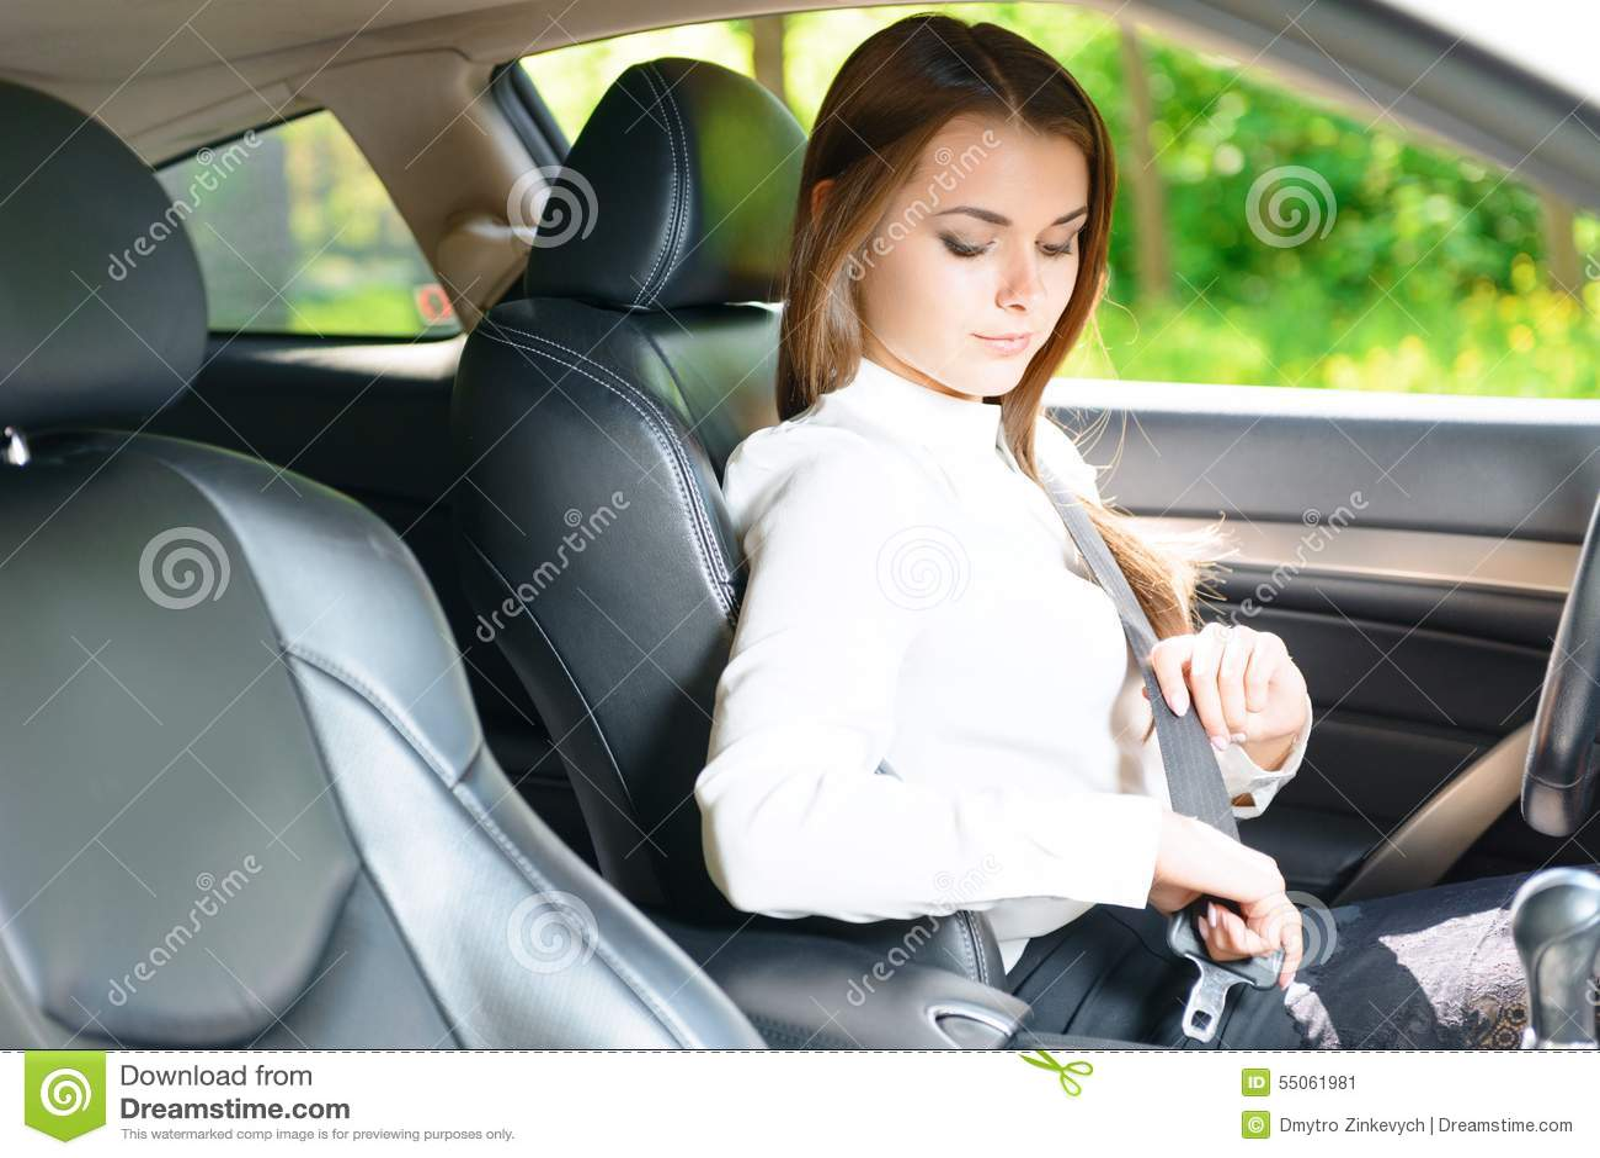 2932x2932 Pubg Android Game 4k Ipad Pro Retina Display Hd: Snap Woman Car Seatbelt Seat Belt Stock Photos Woman Car